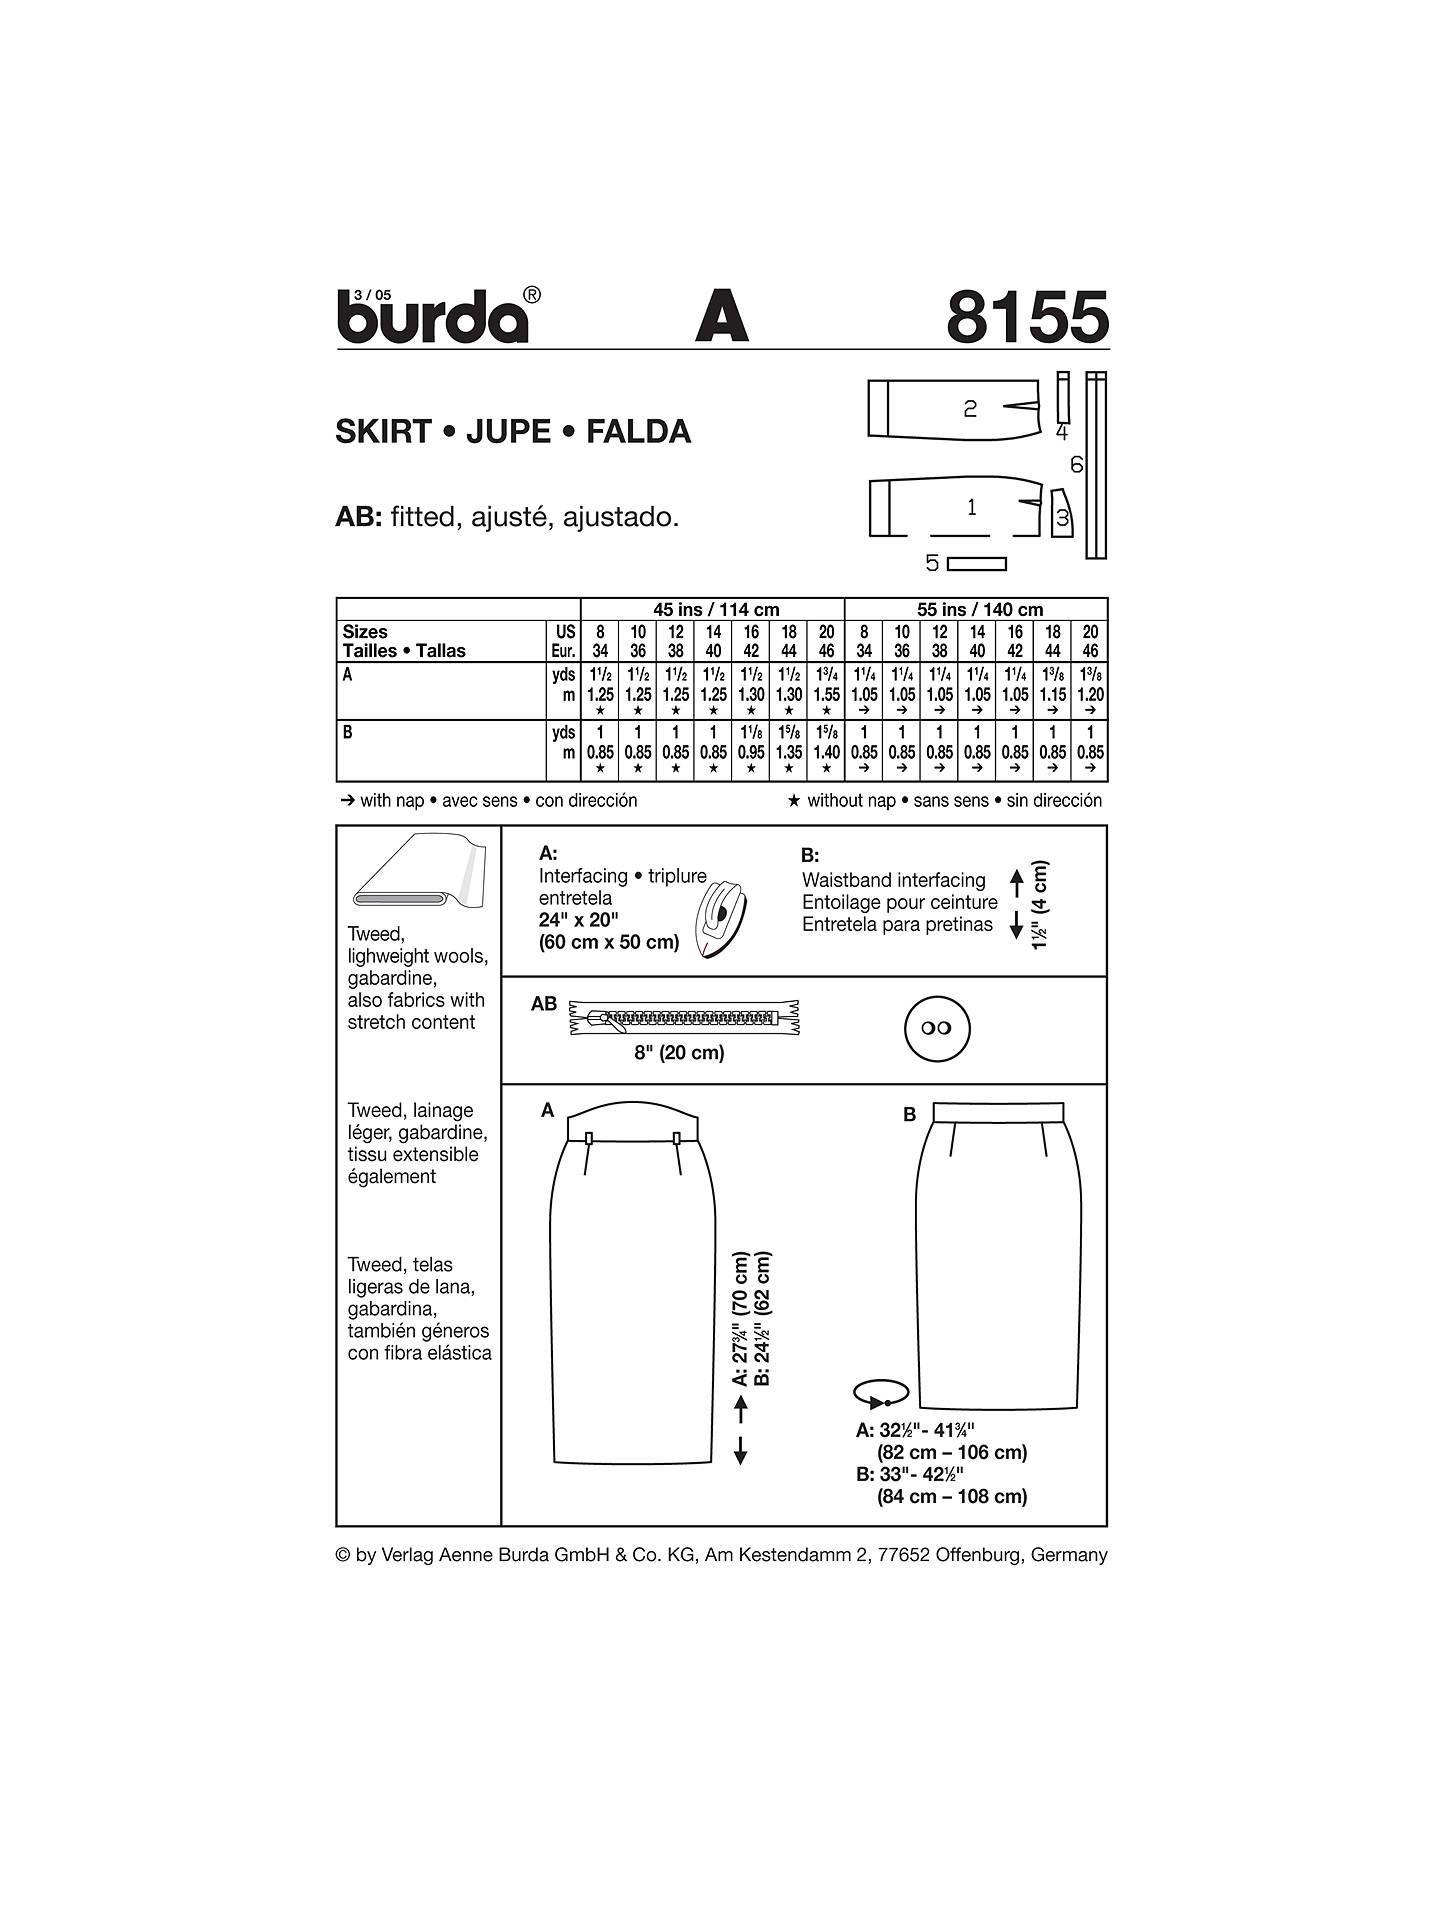 Burda Women's Pencil Skirt Sewing Pattern, 8155 at John